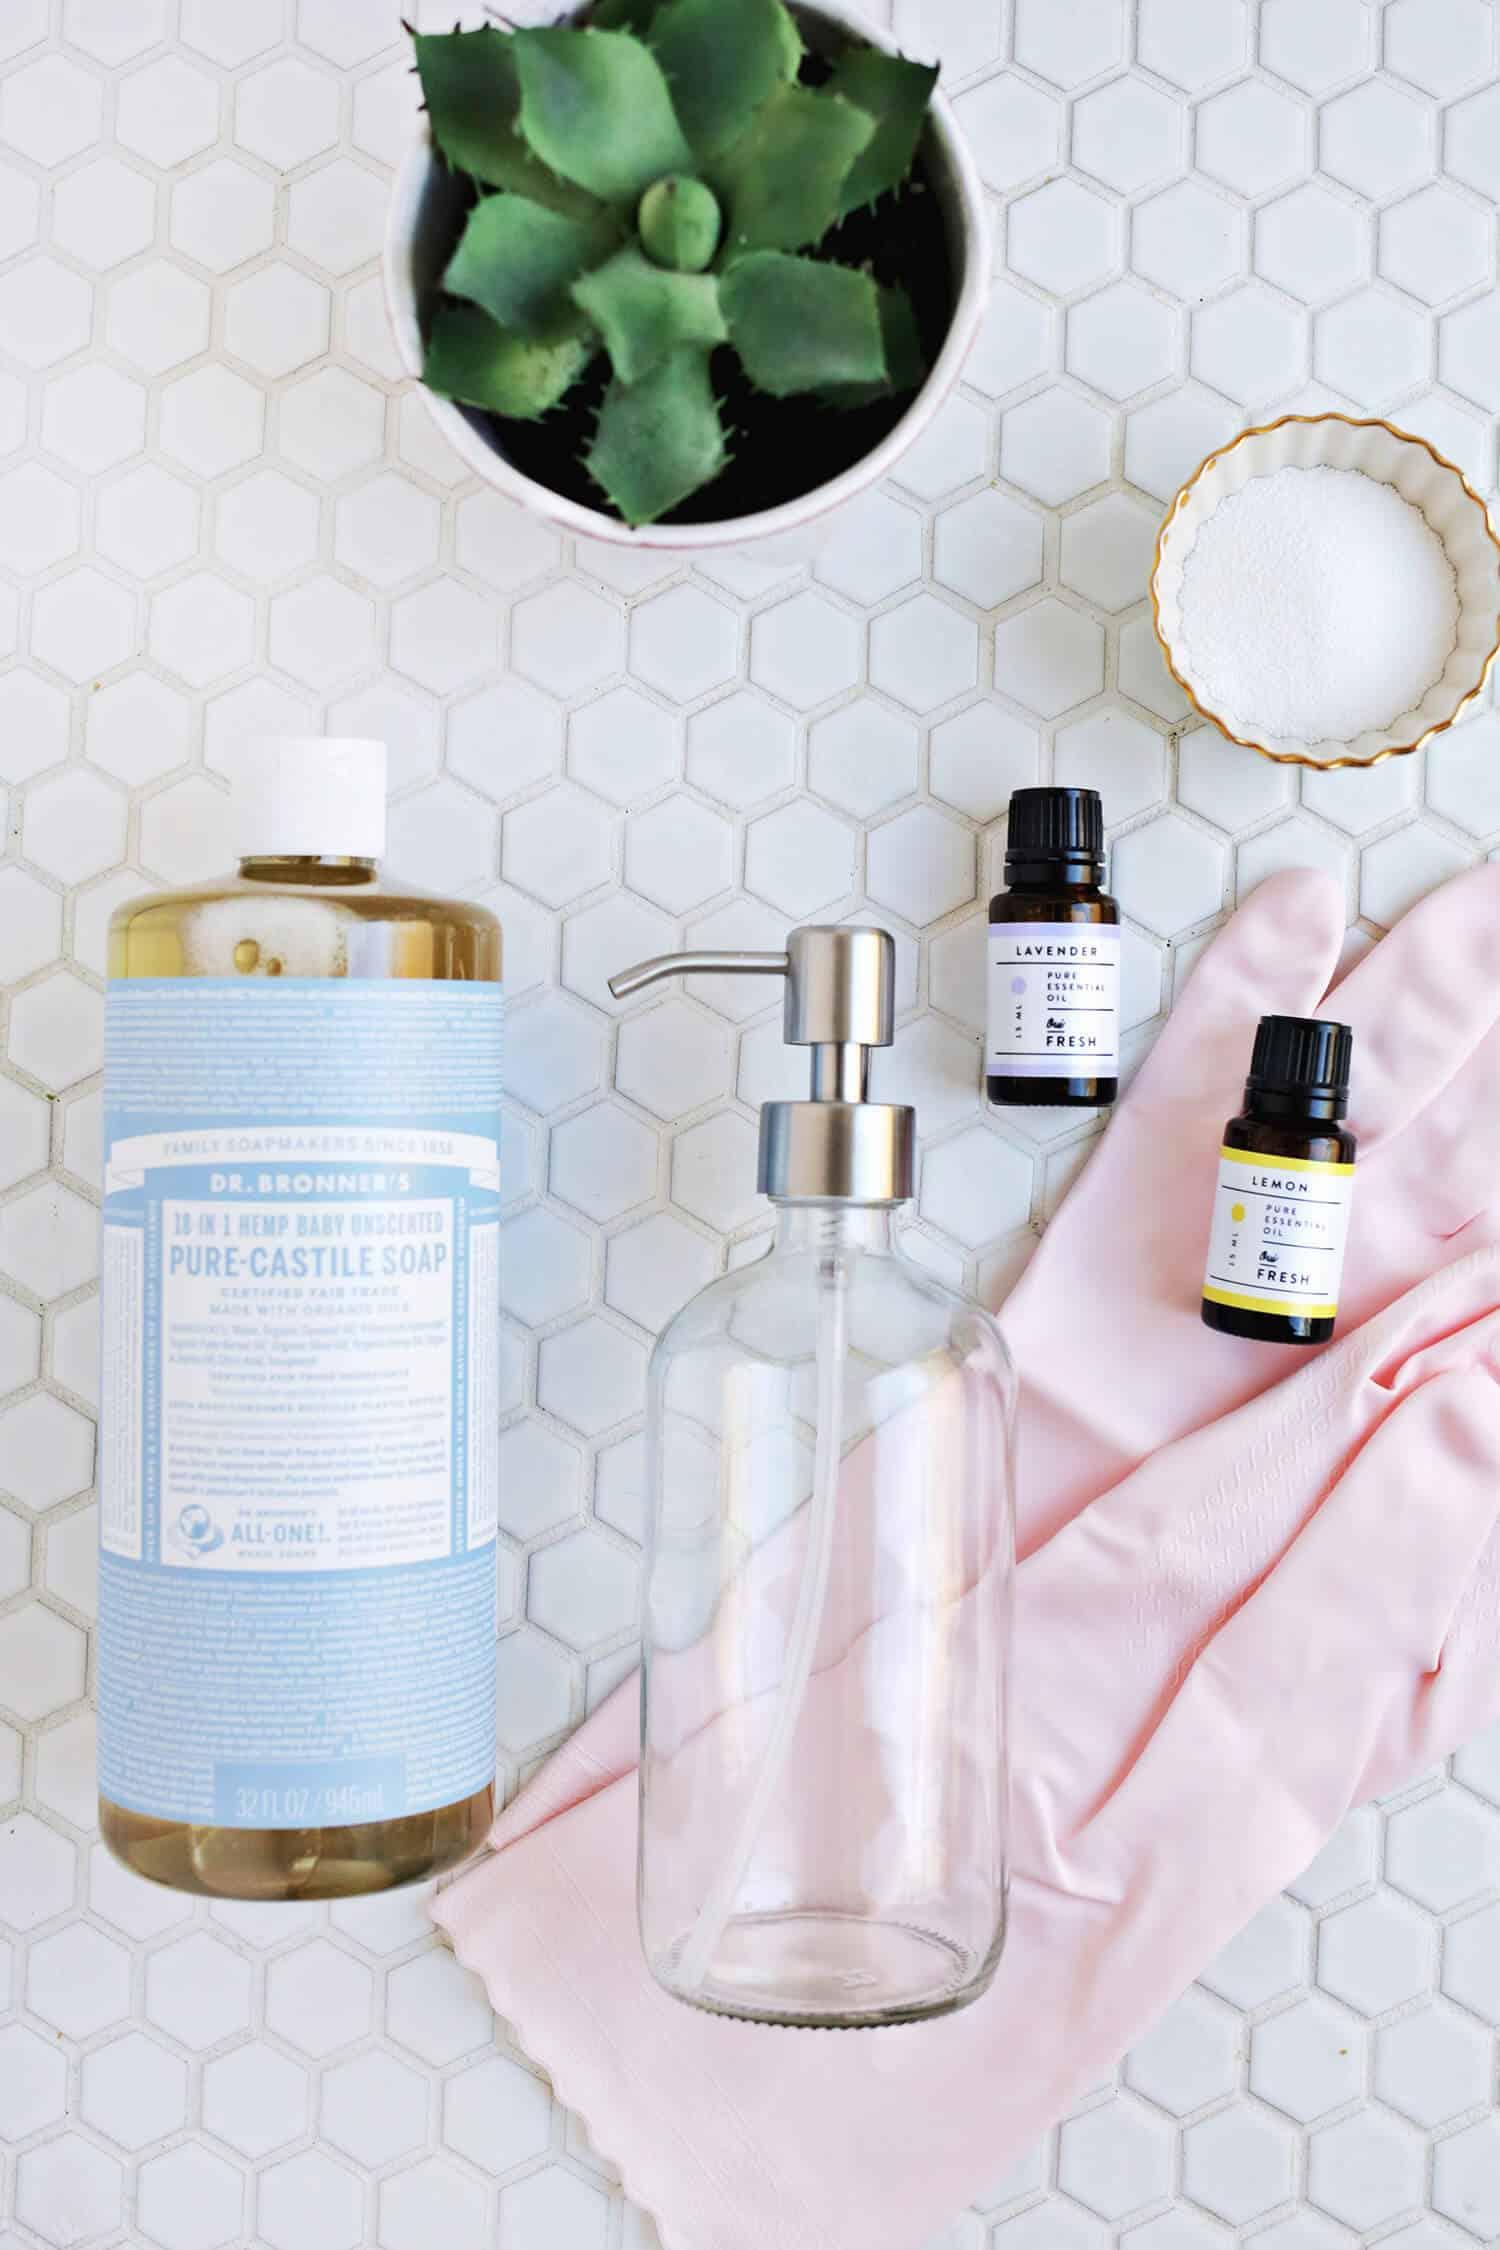 All Posts A Beautiful Mess Splash Bottle Acs Series Lavender Lemon Dish Soap Makes 1 2 Cups